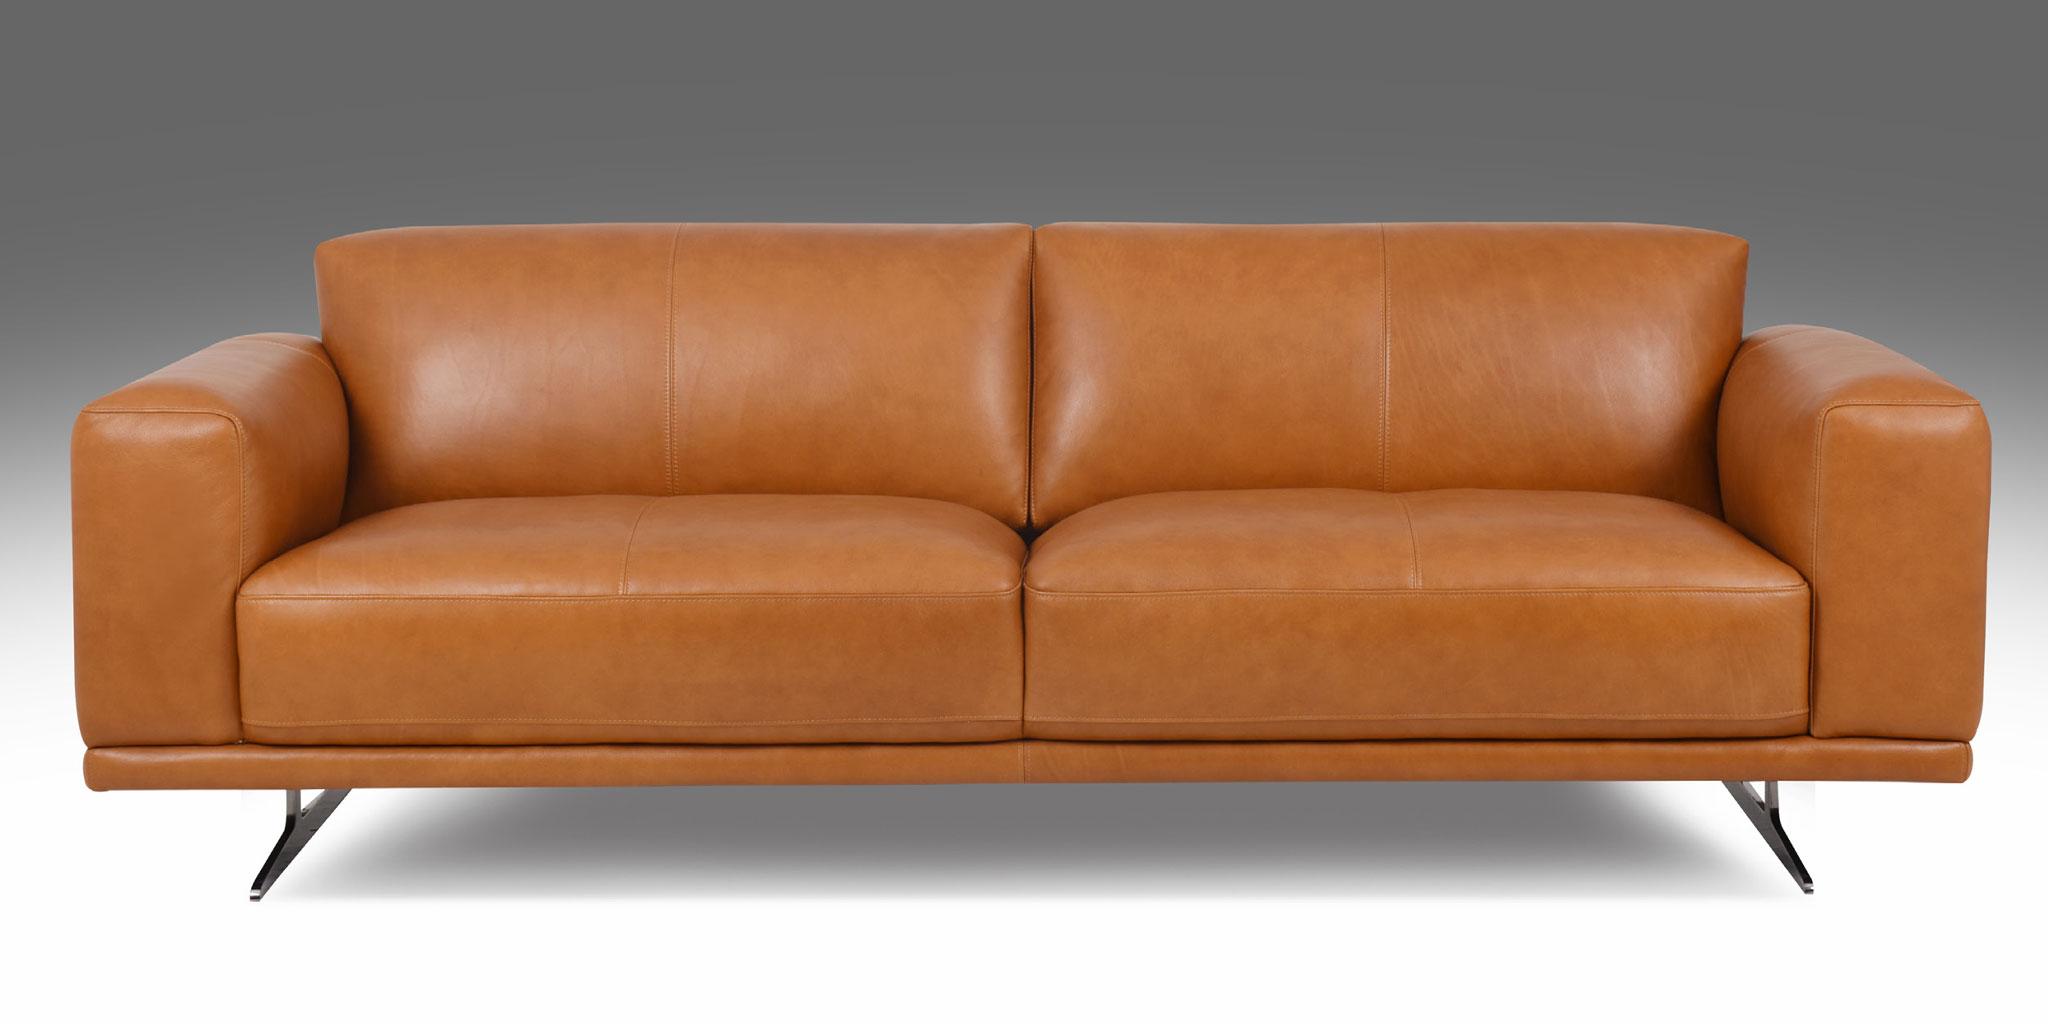 Vierzon Sofa